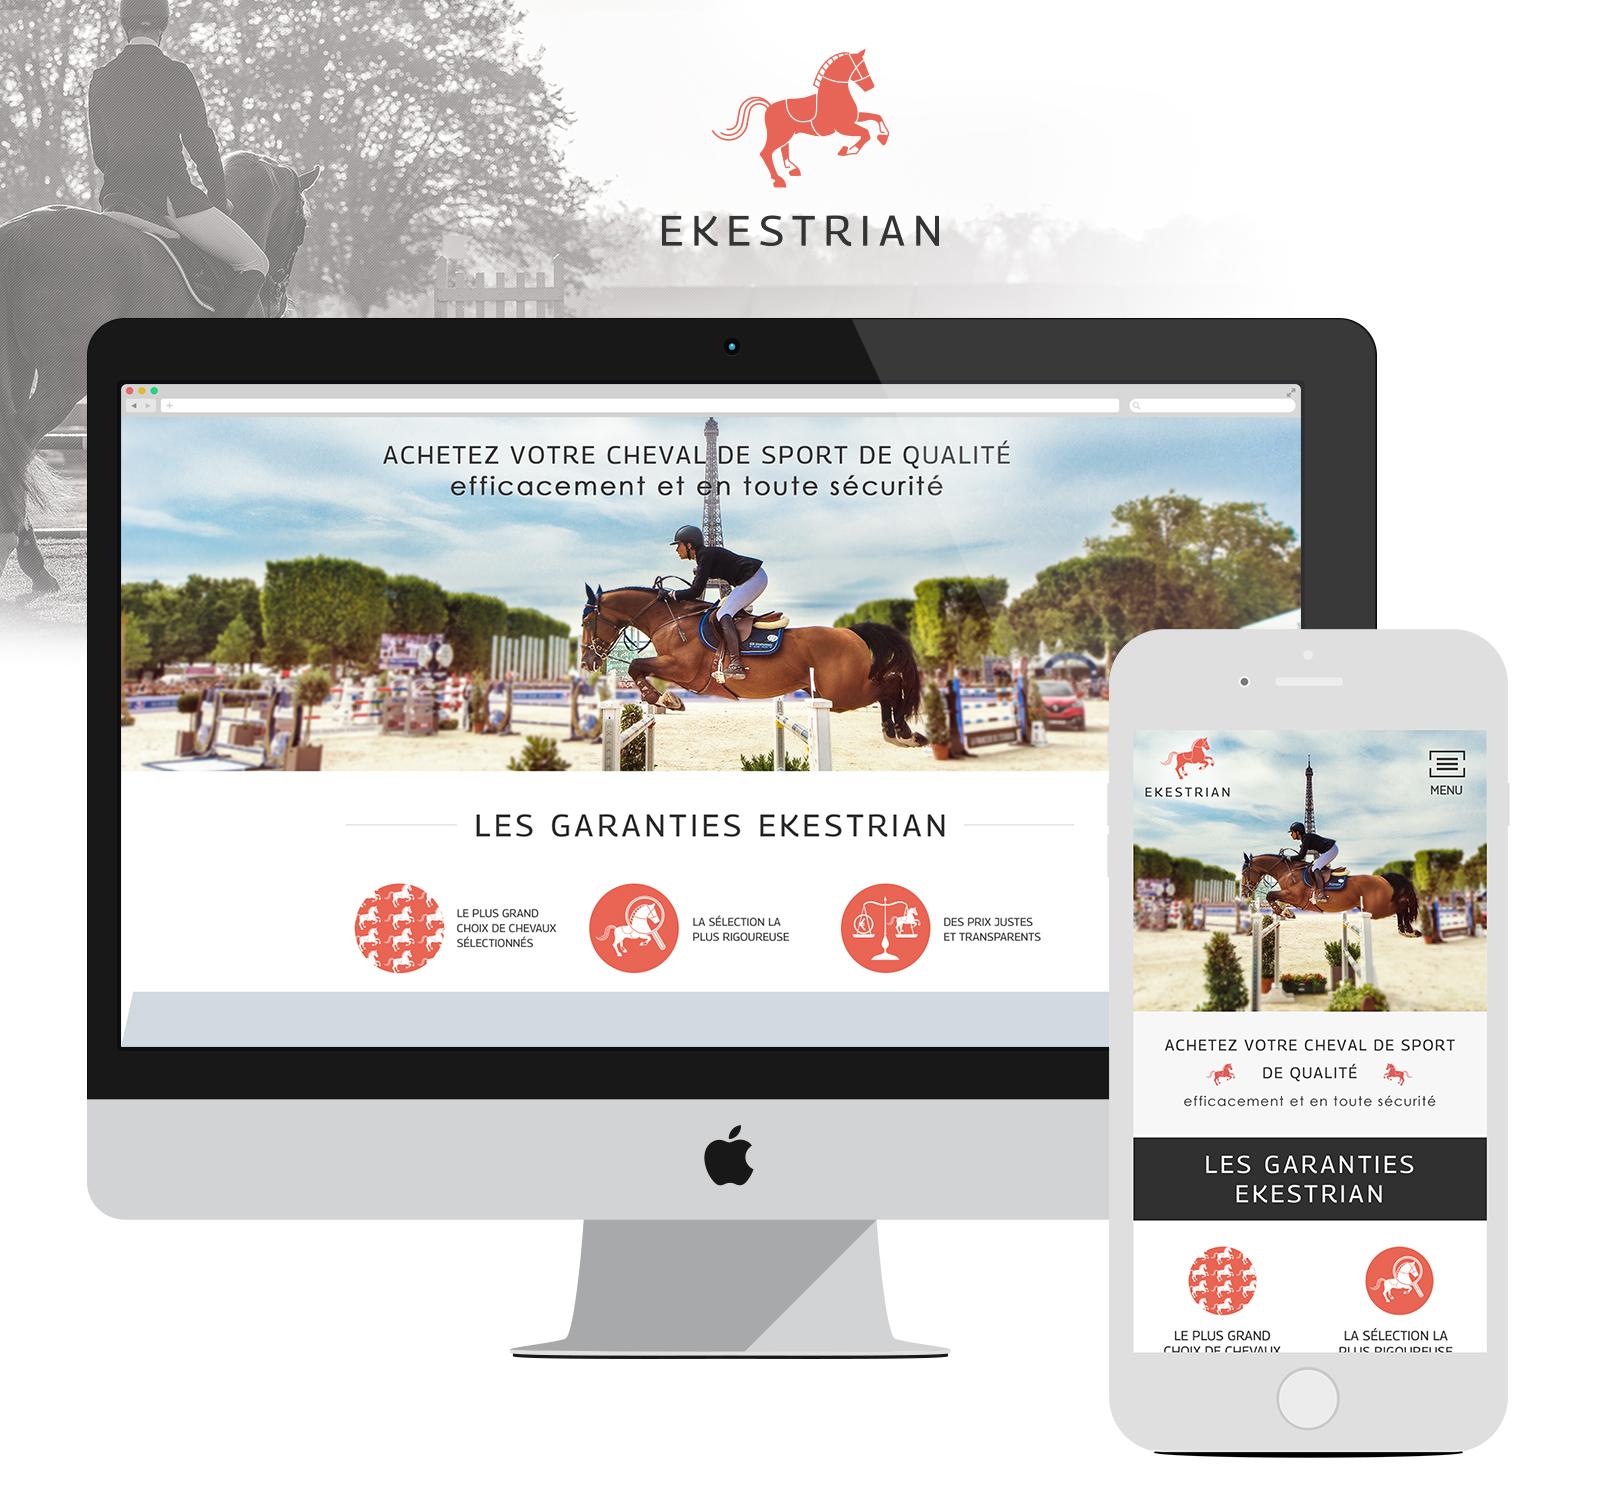 Ekestrian - Achats de chevaux de sport